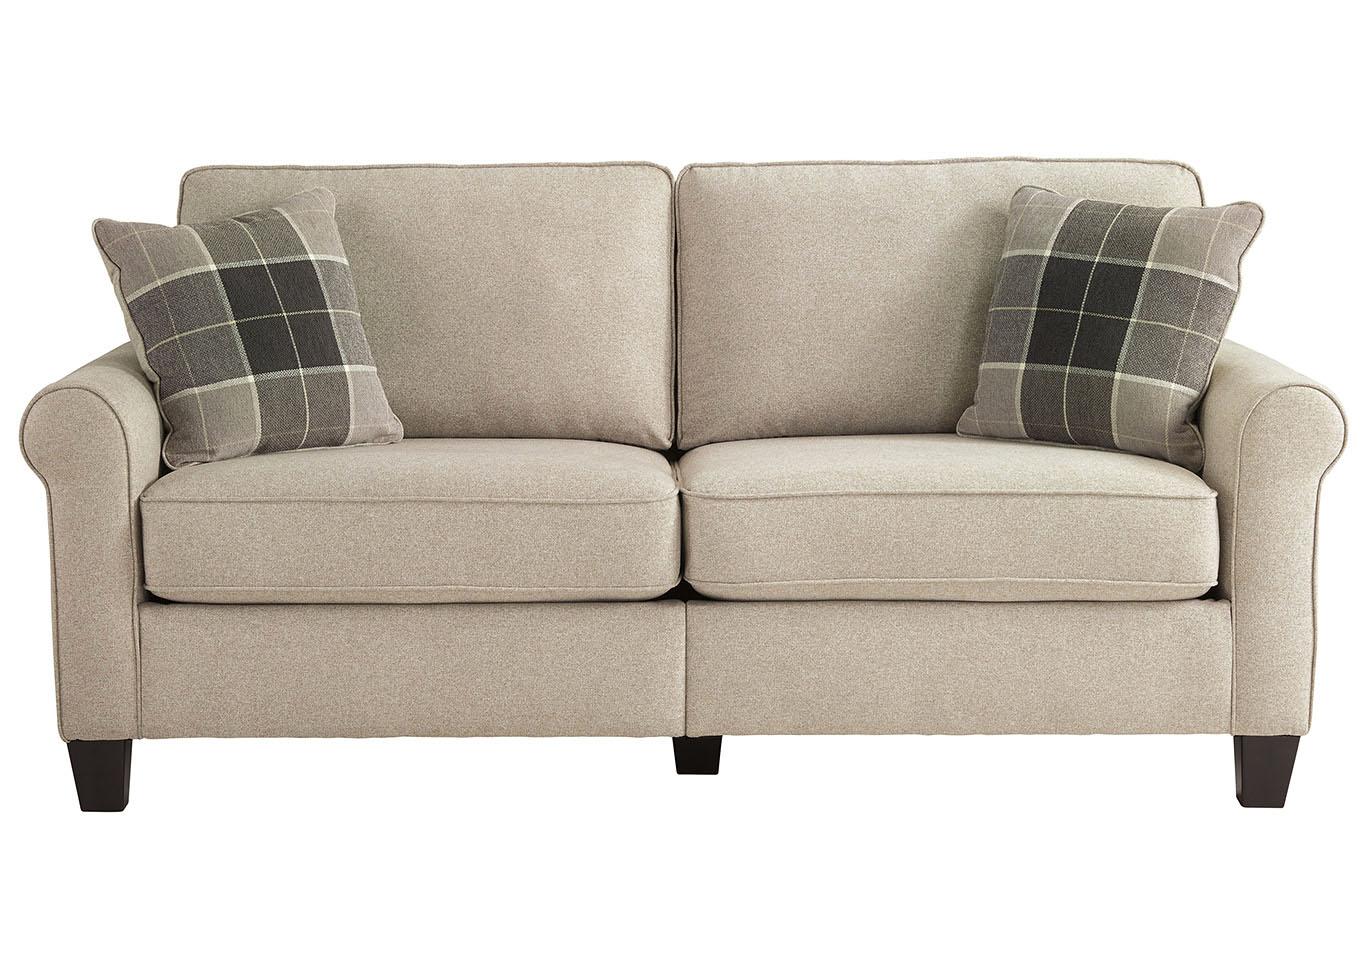 Astonishing Direct Buy Furniture Philadelphia Pa Lingen Fossil Sofa Download Free Architecture Designs Crovemadebymaigaardcom